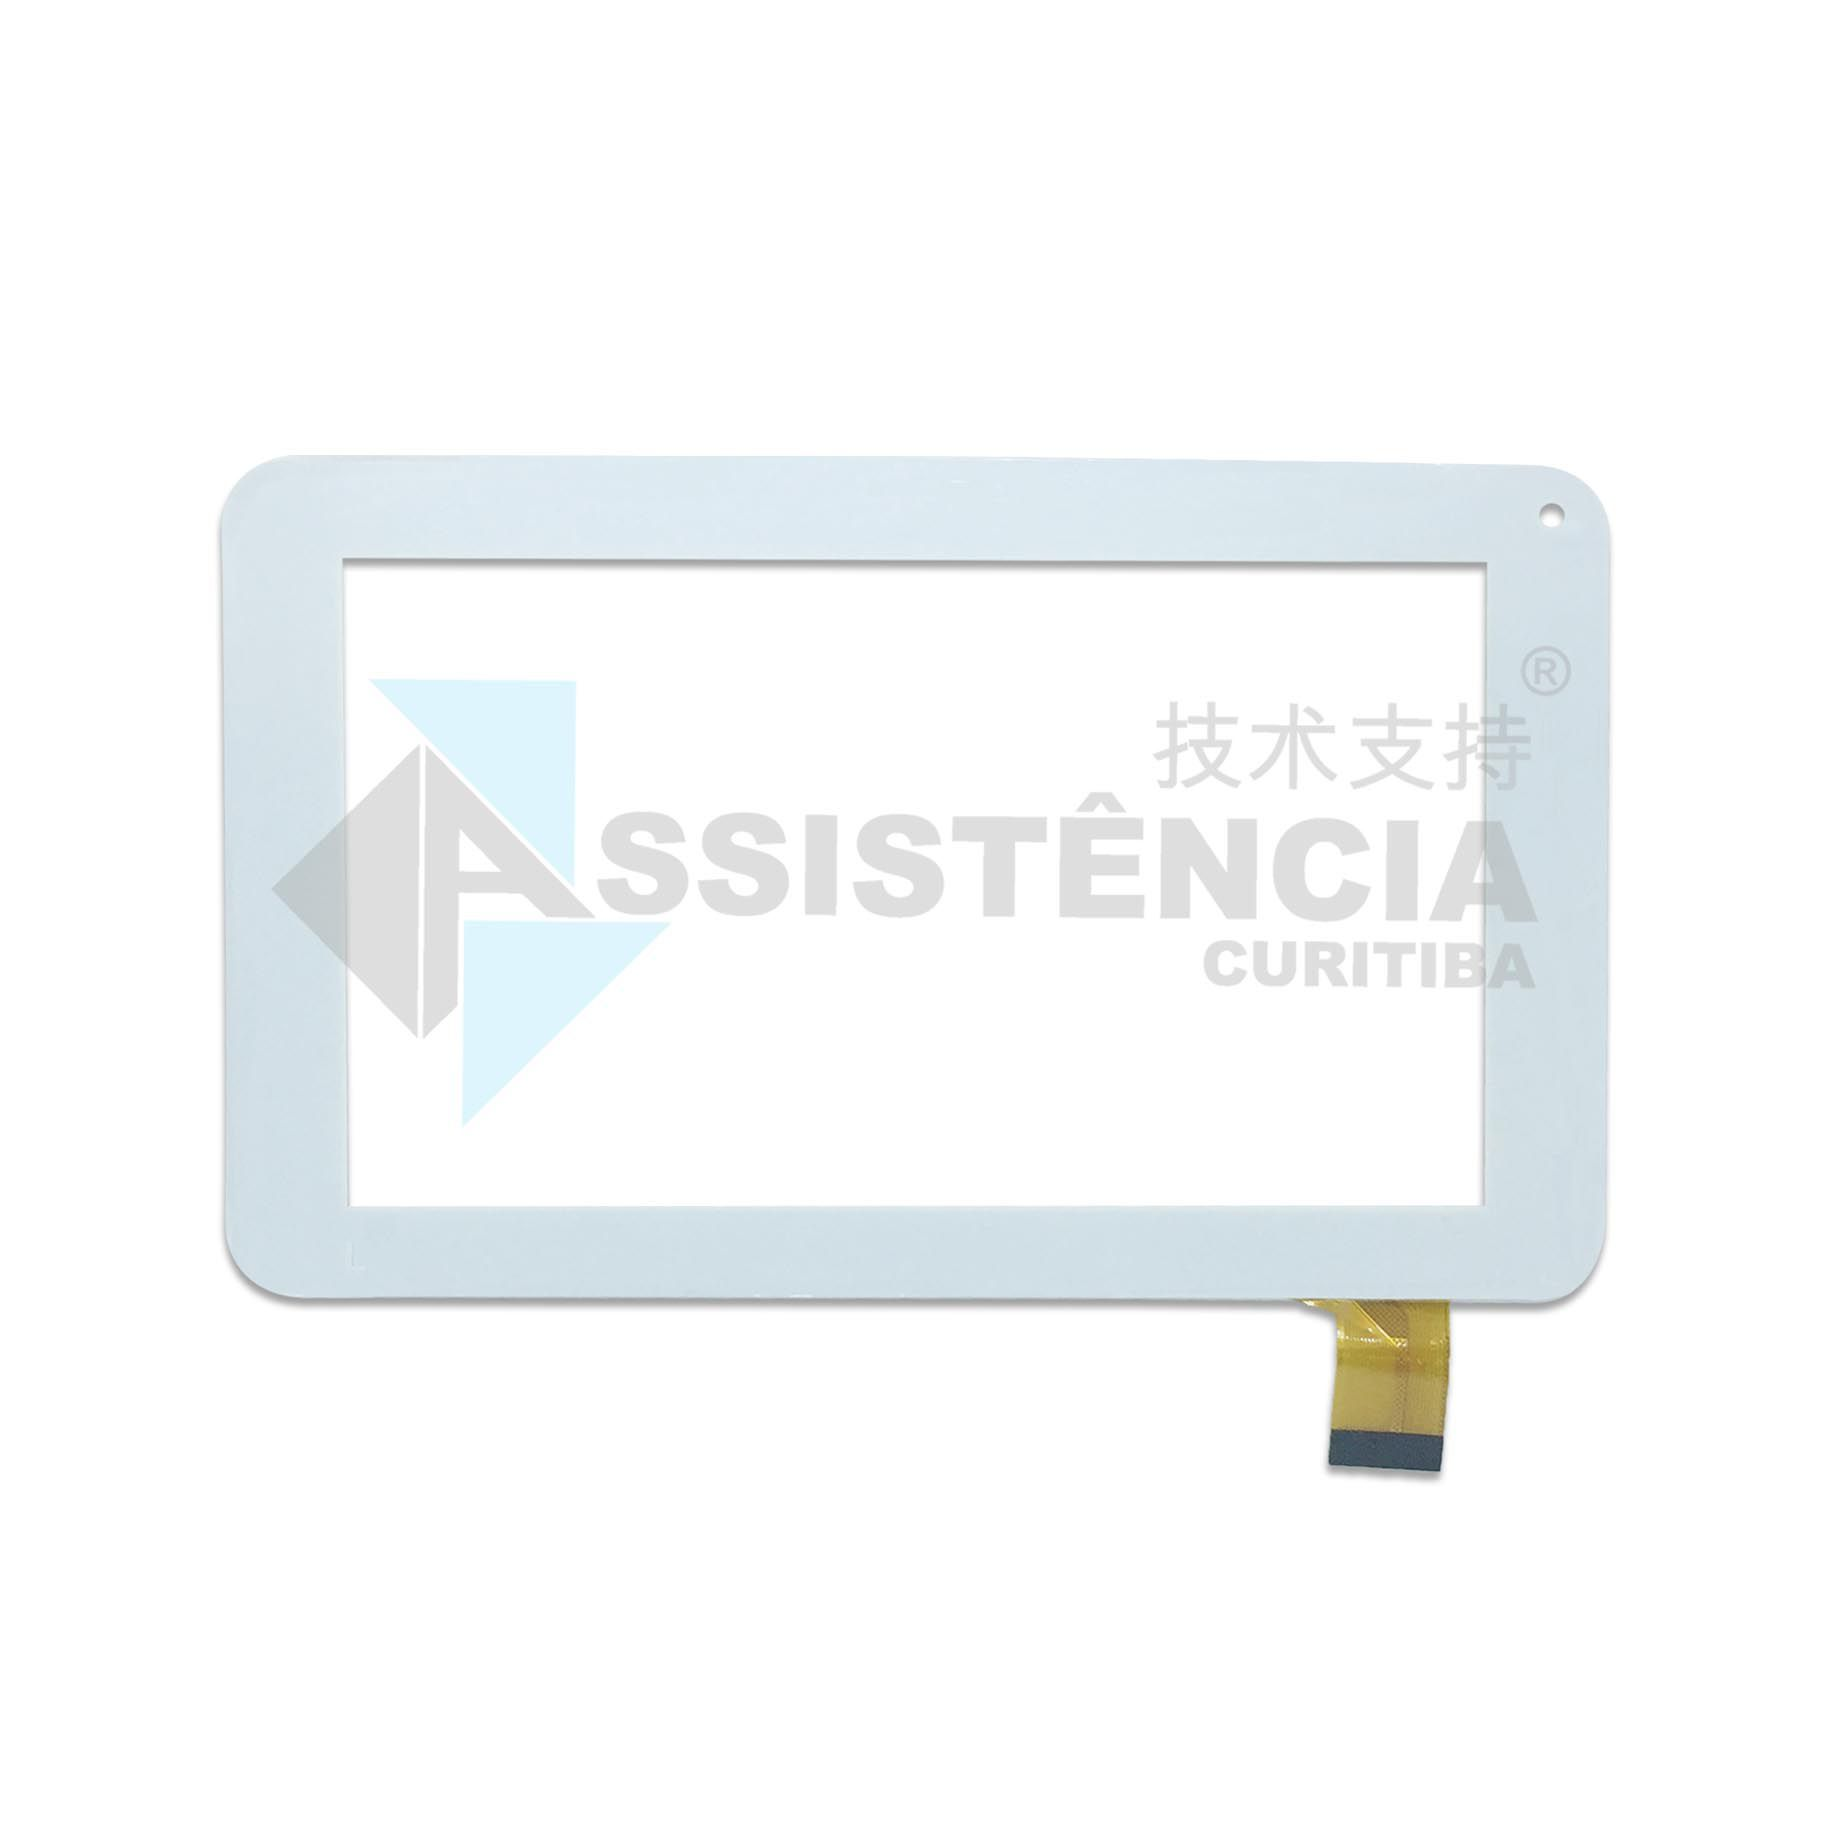 Tela Touch Cce Motion Plus Tr-72 Tr72 Branco